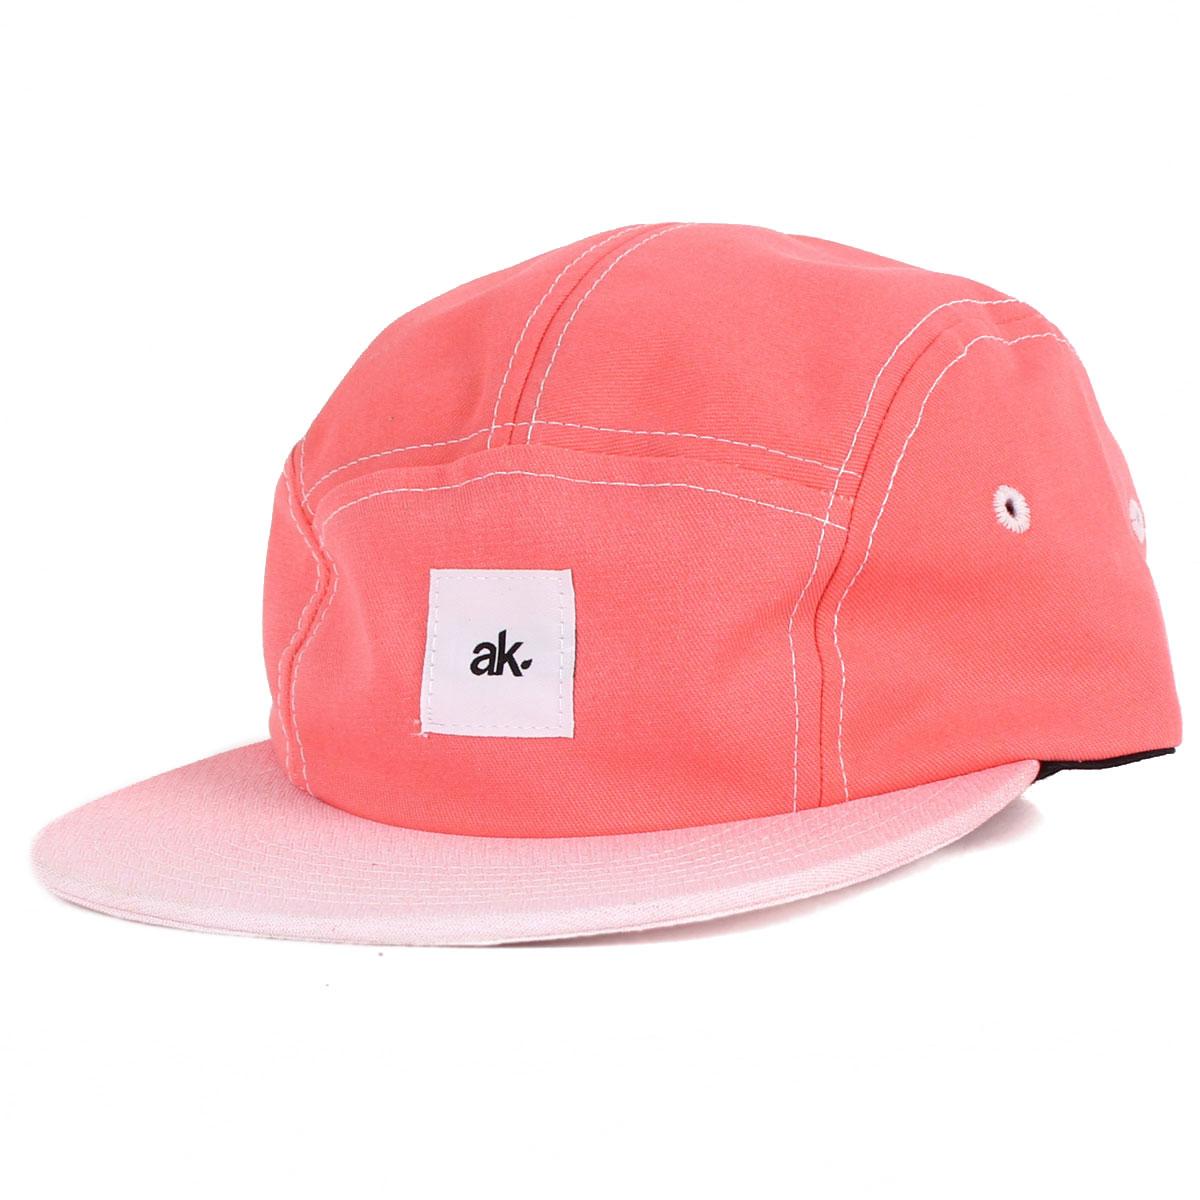 Image of Akomplice - Get Faded Camper Hat in Orange/Red